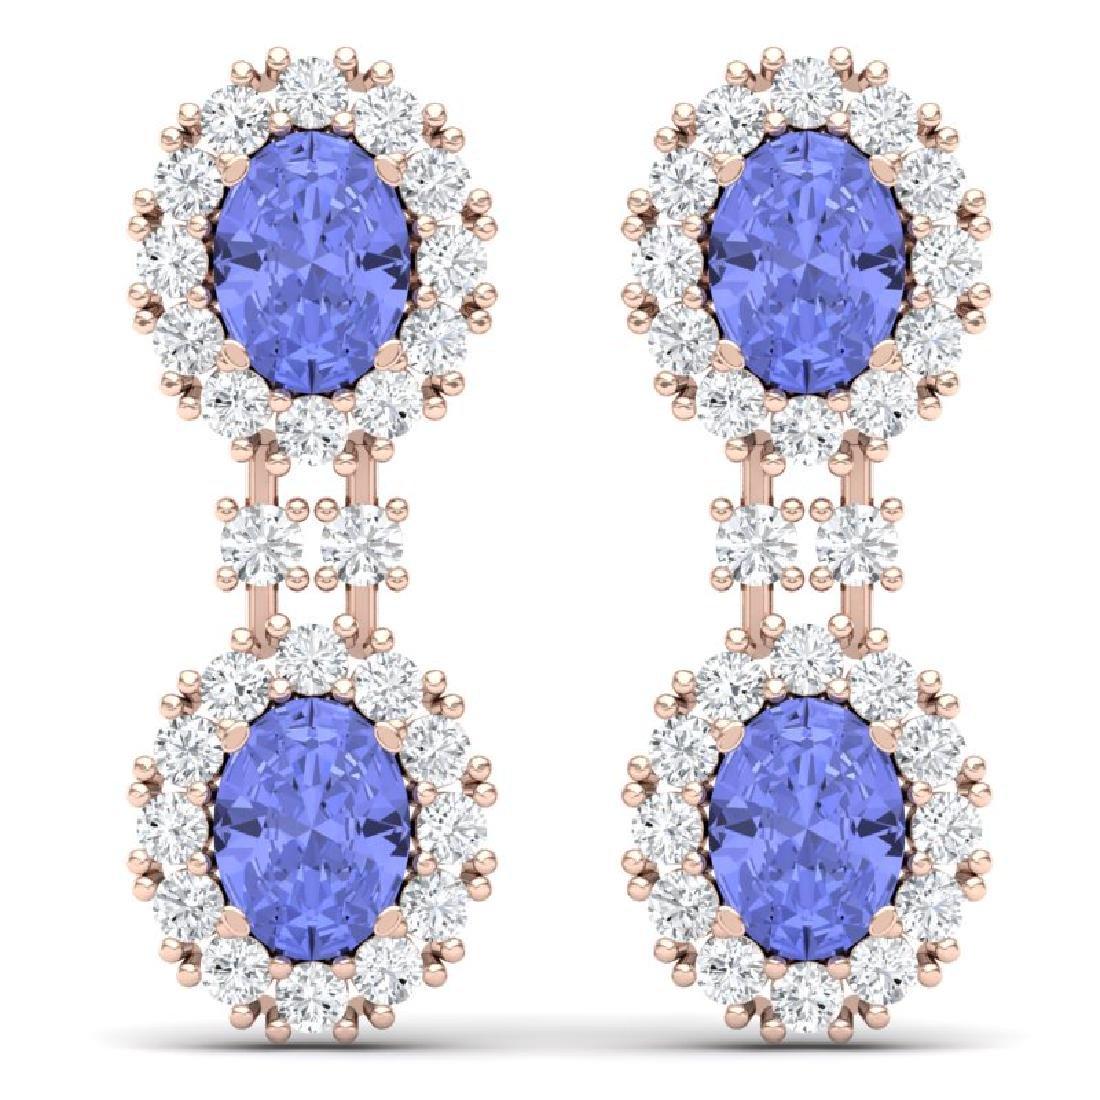 8.35 CTW Royalty Tanzanite & VS Diamond Earrings 18K